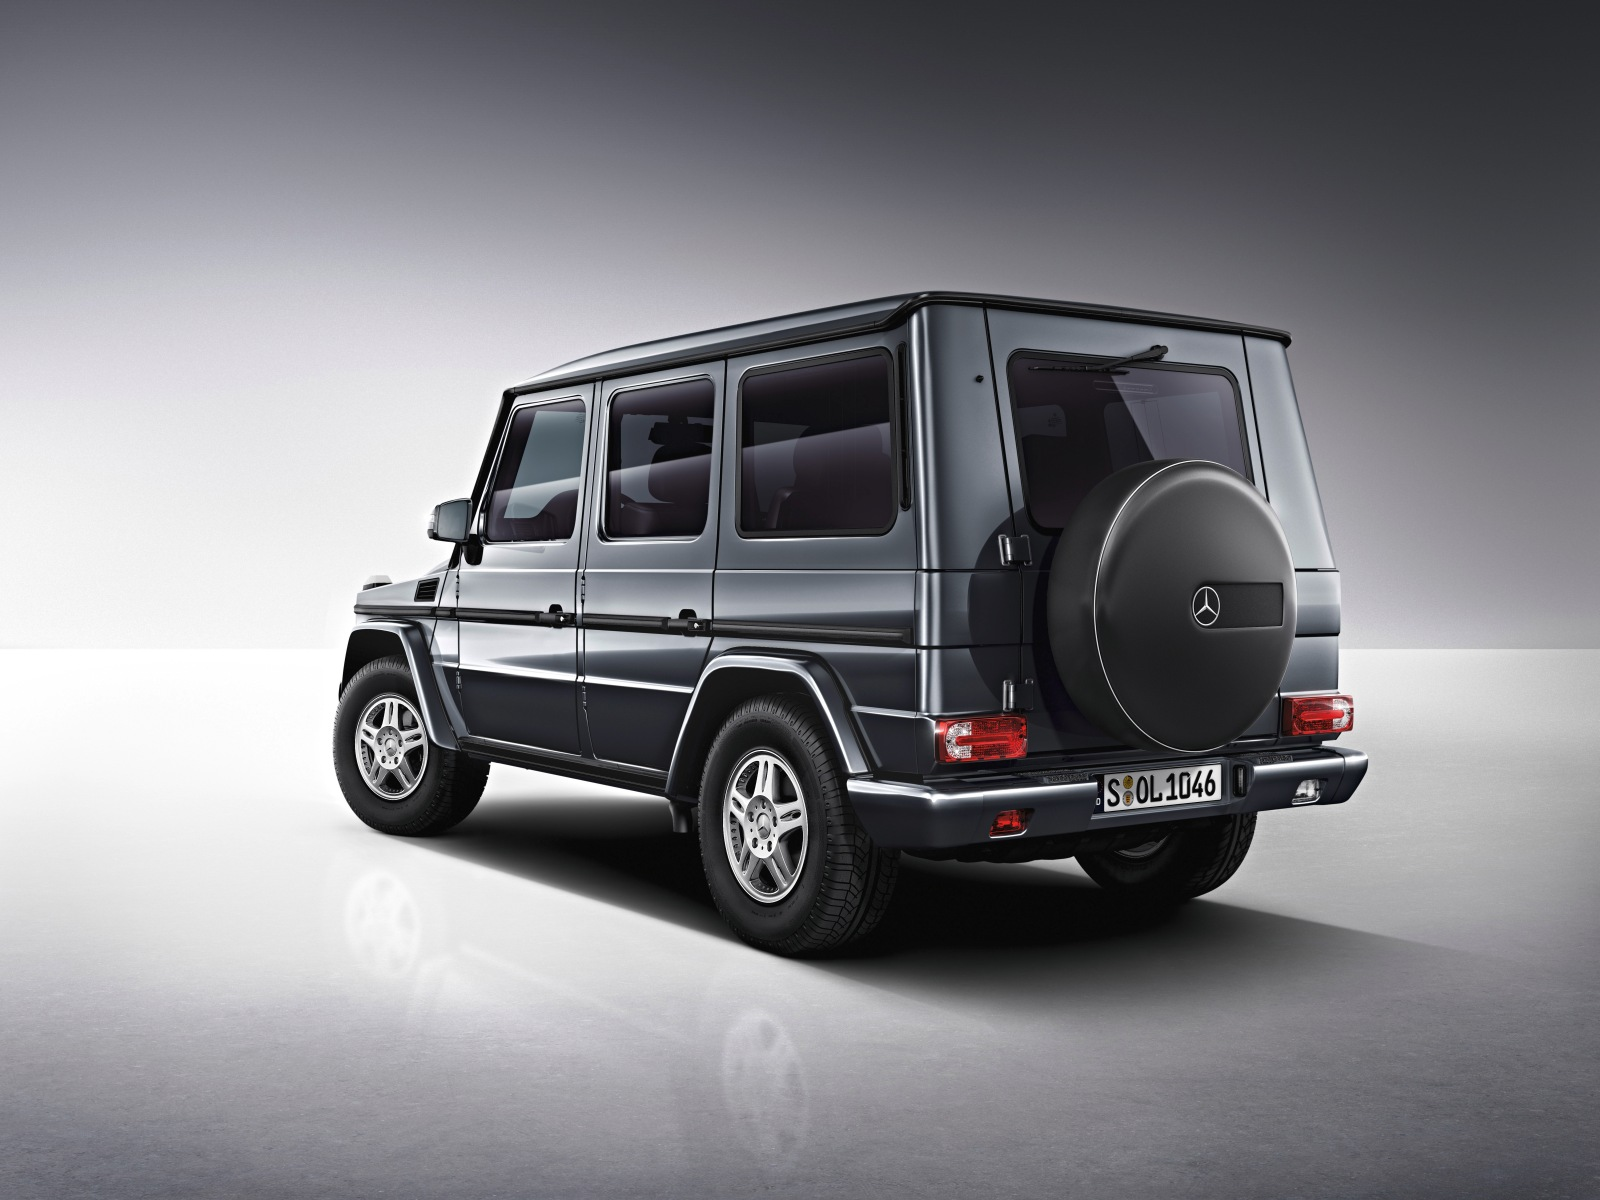 mercedes benz classe g para quem gosta de aventura car. Black Bedroom Furniture Sets. Home Design Ideas